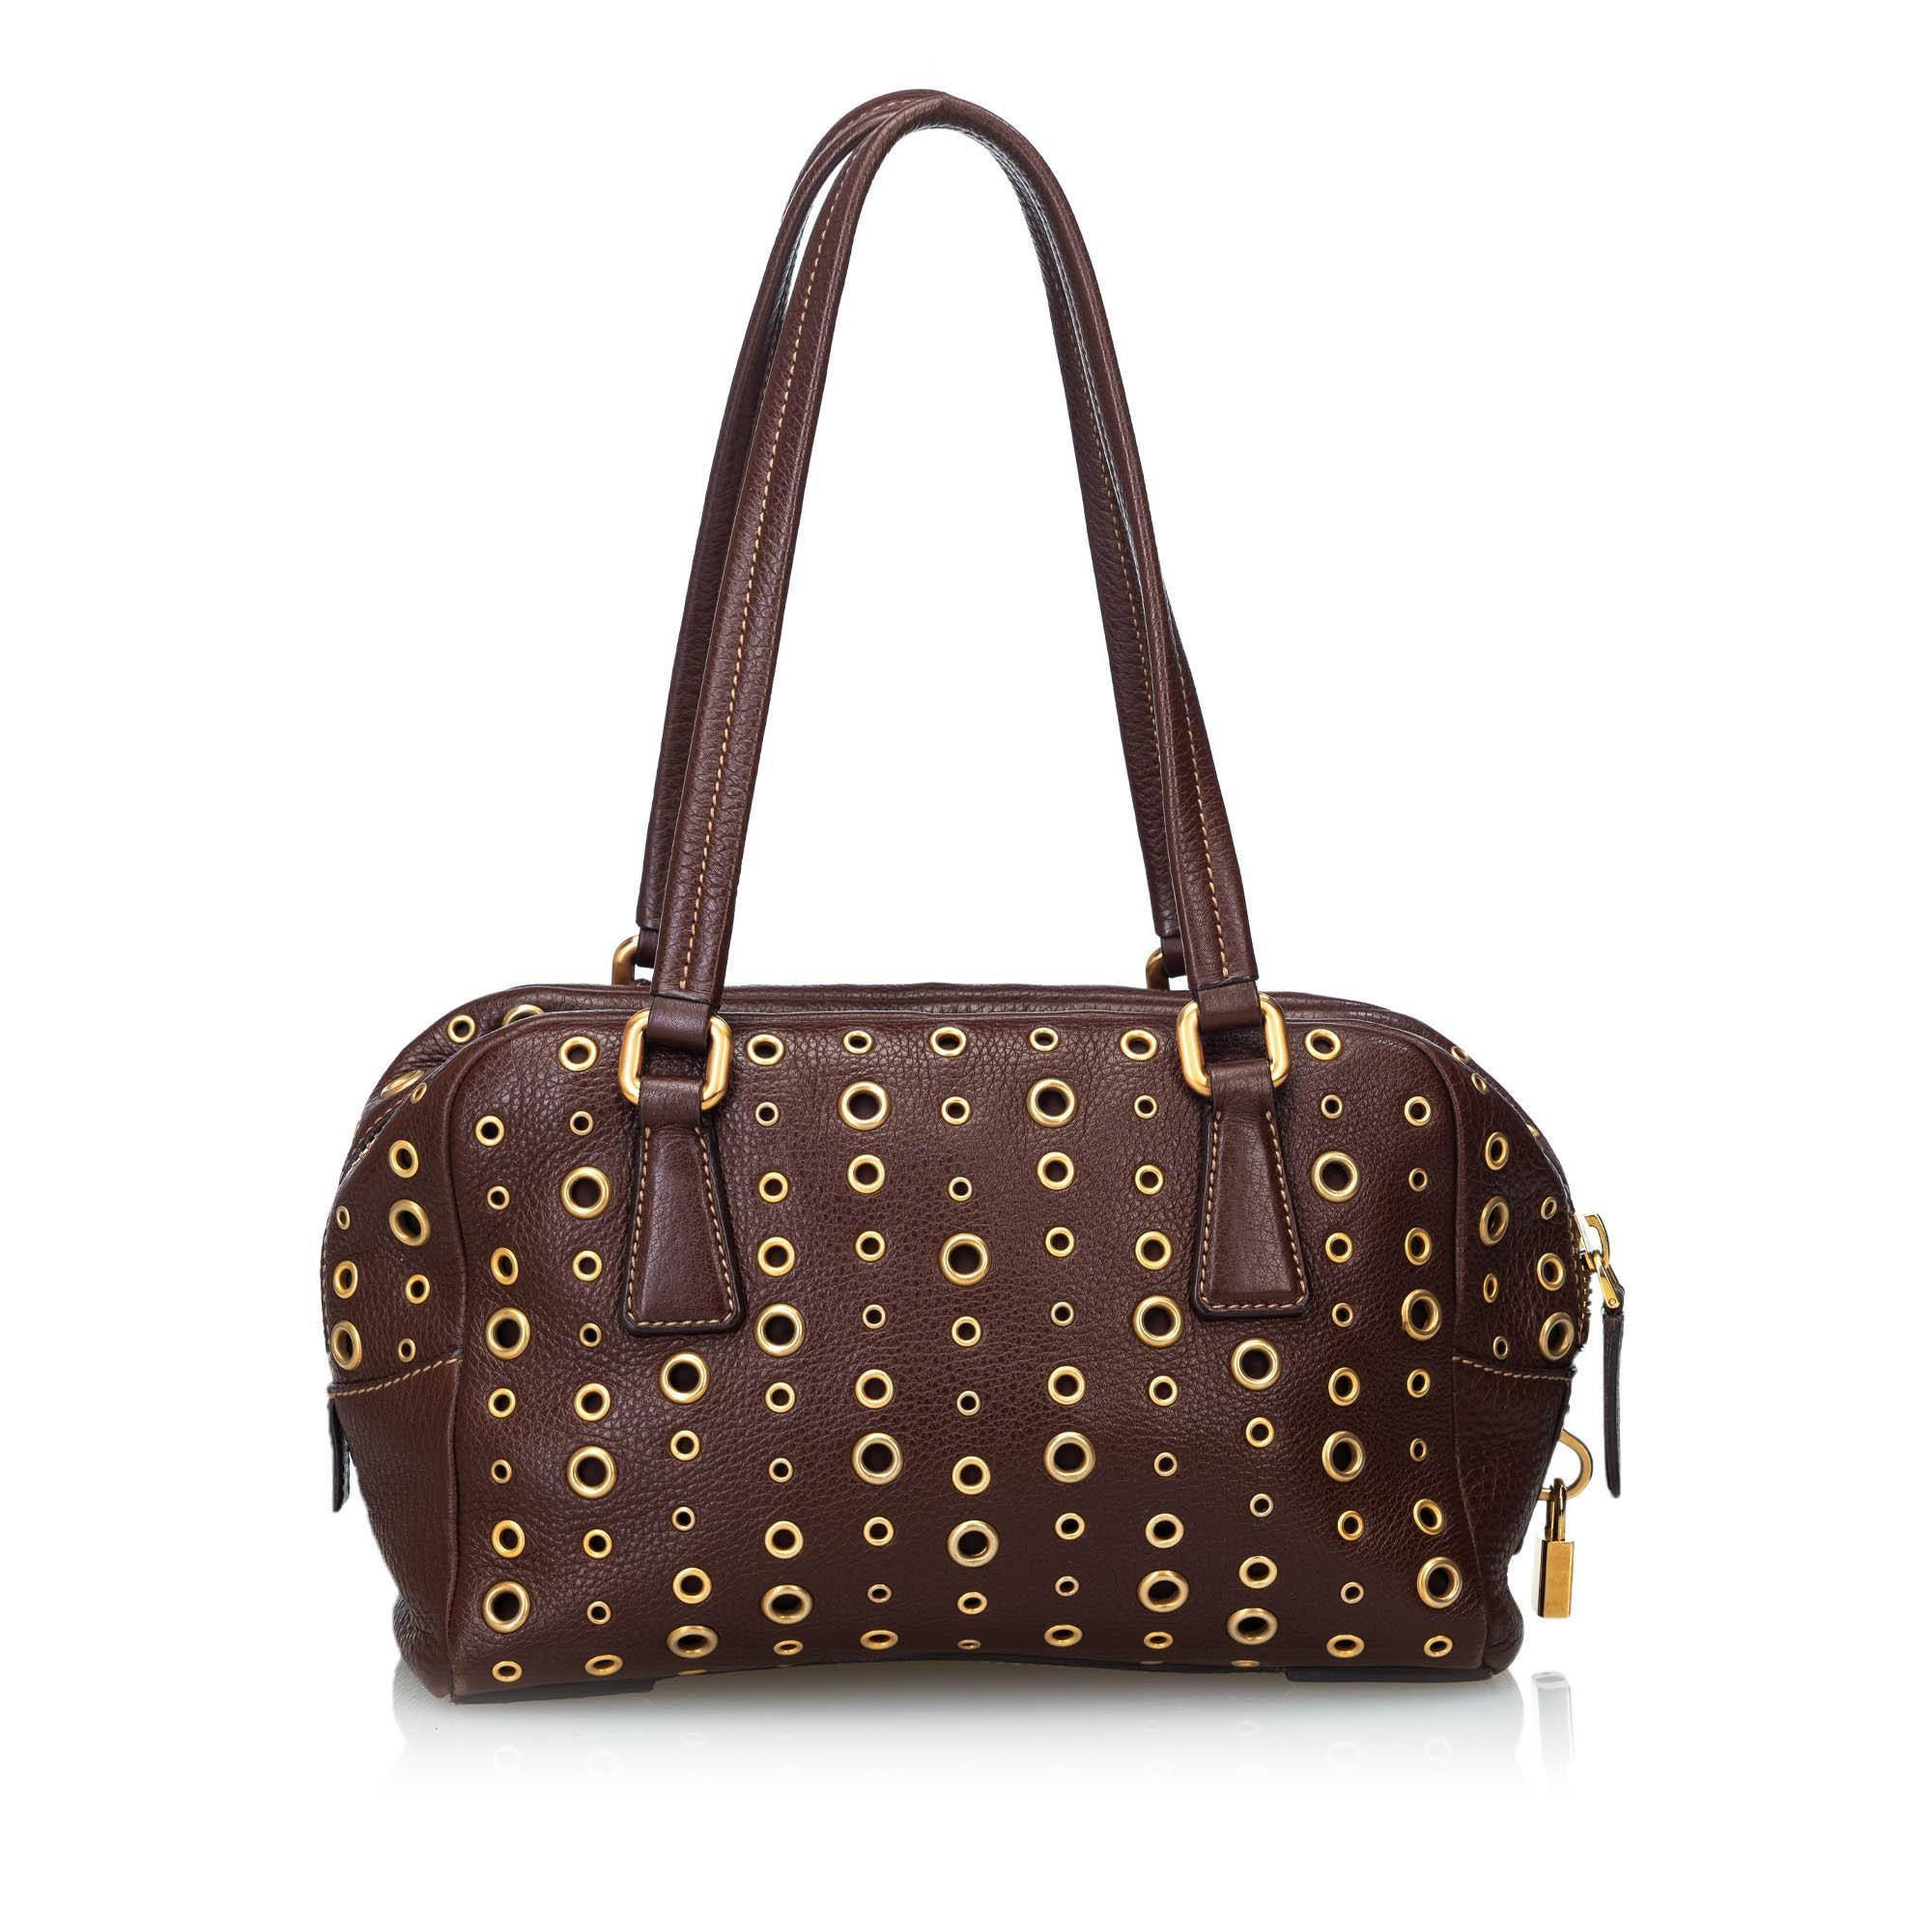 a149de20bfce Prada Brown Dark Brown Leather Grommet Shoulder Bag Italy at 1stdibs